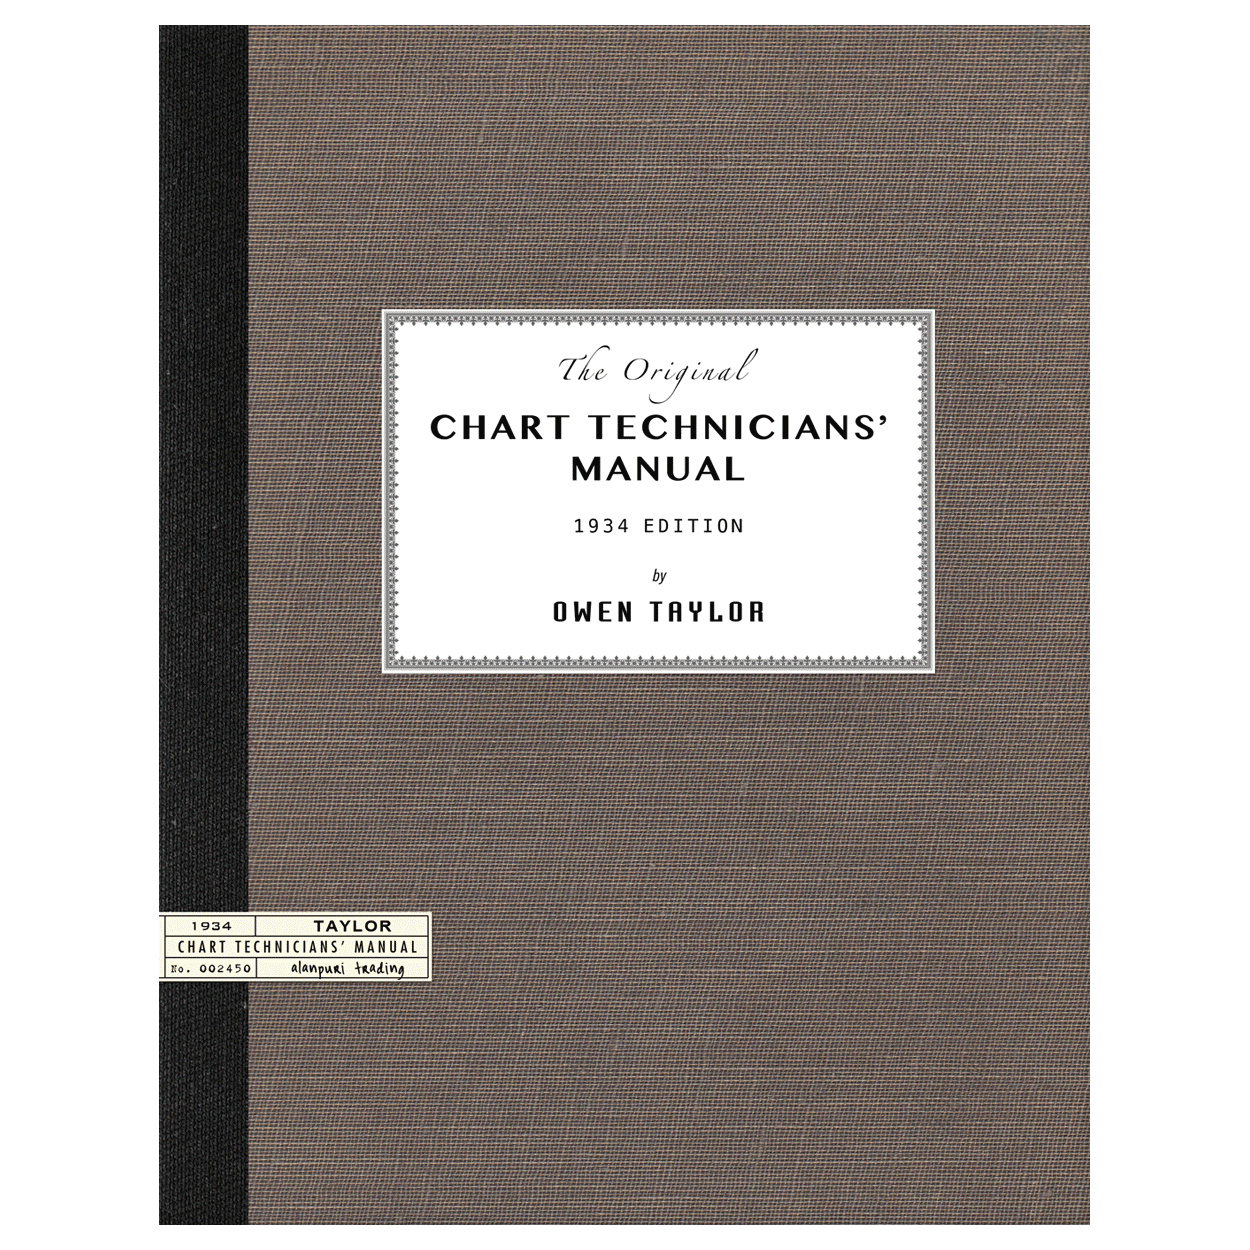 Chart Technicians' Manual (1934) by Owen Taylor